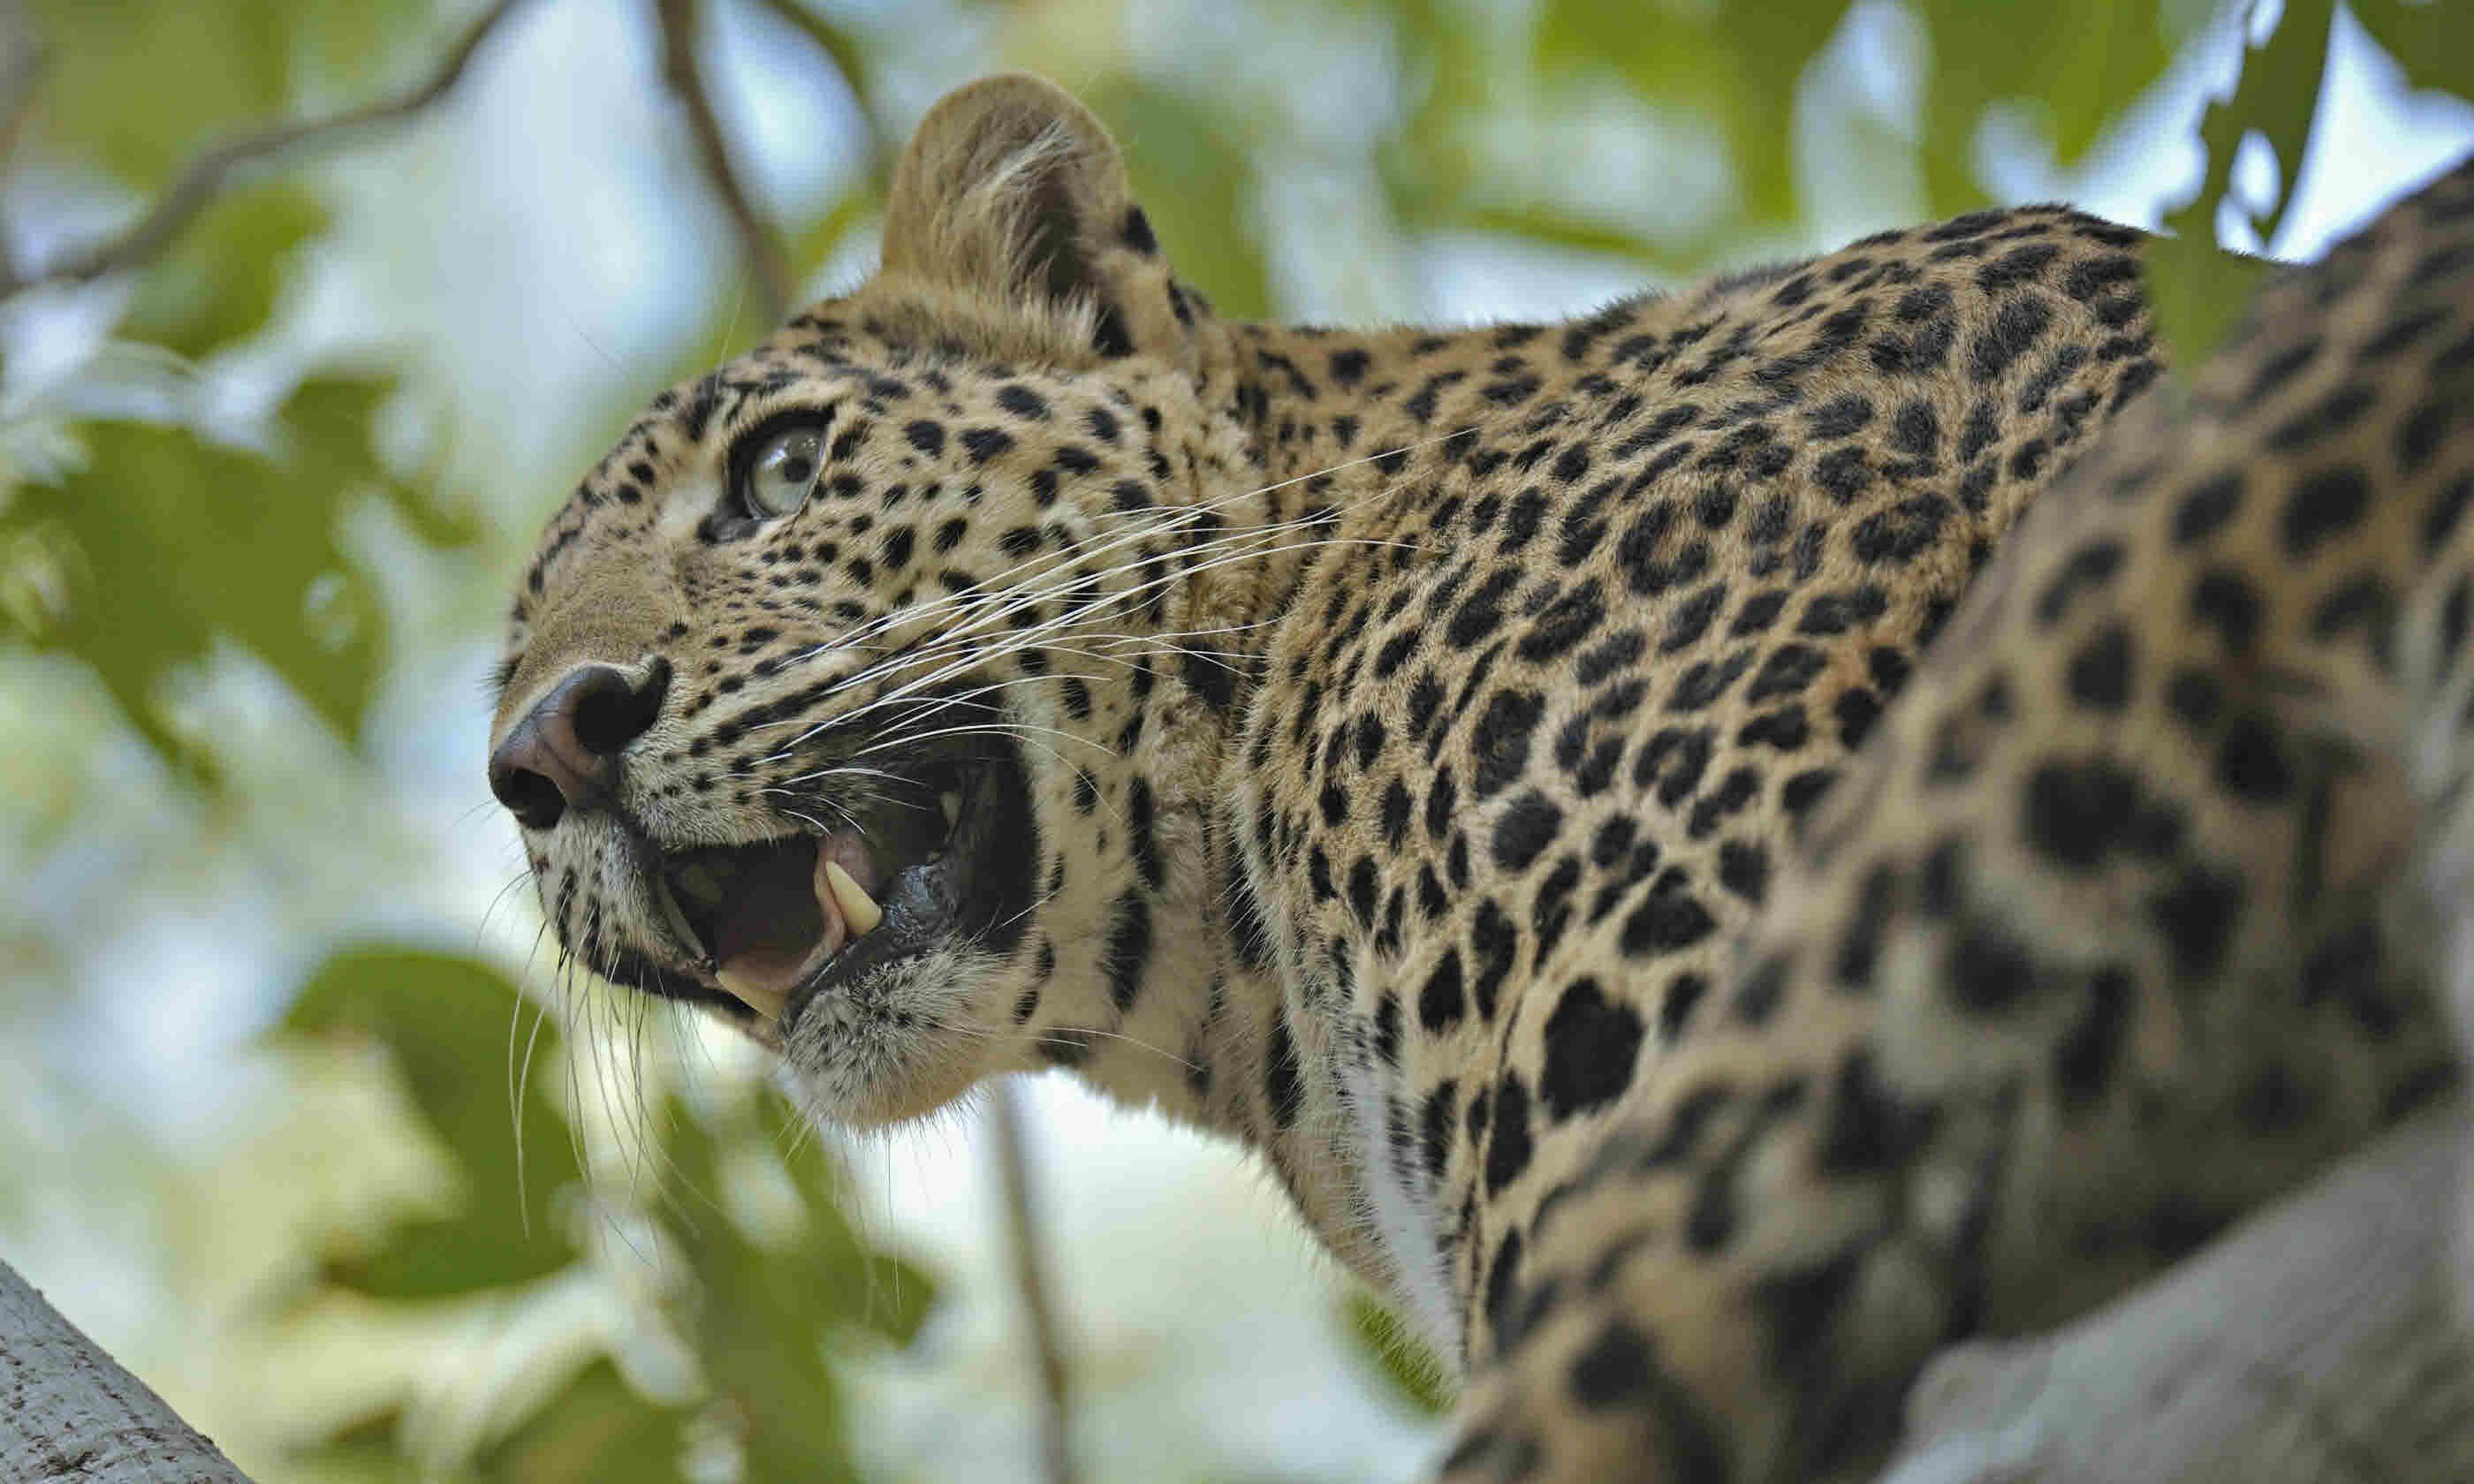 Leopard in Ranthambhore tiger reserve (Shutterstock)